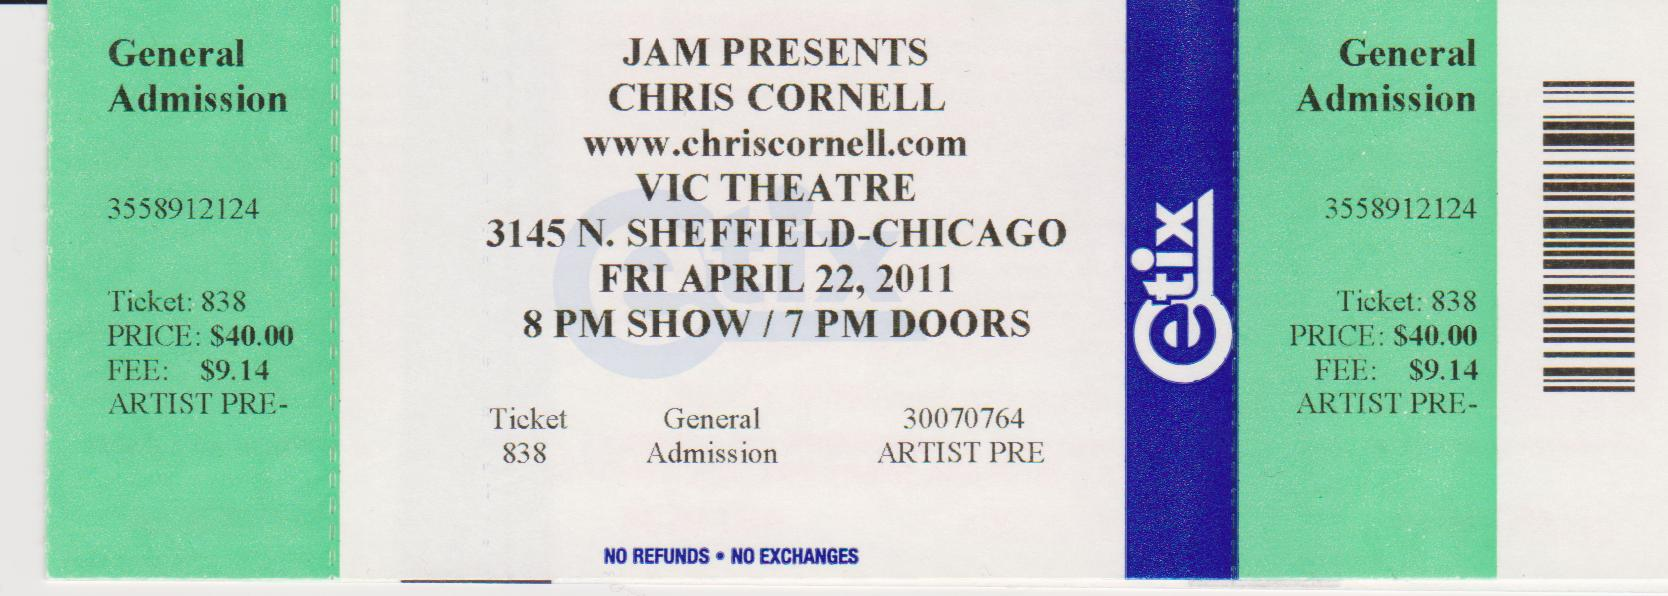 chris cornell ticket 001.jpg